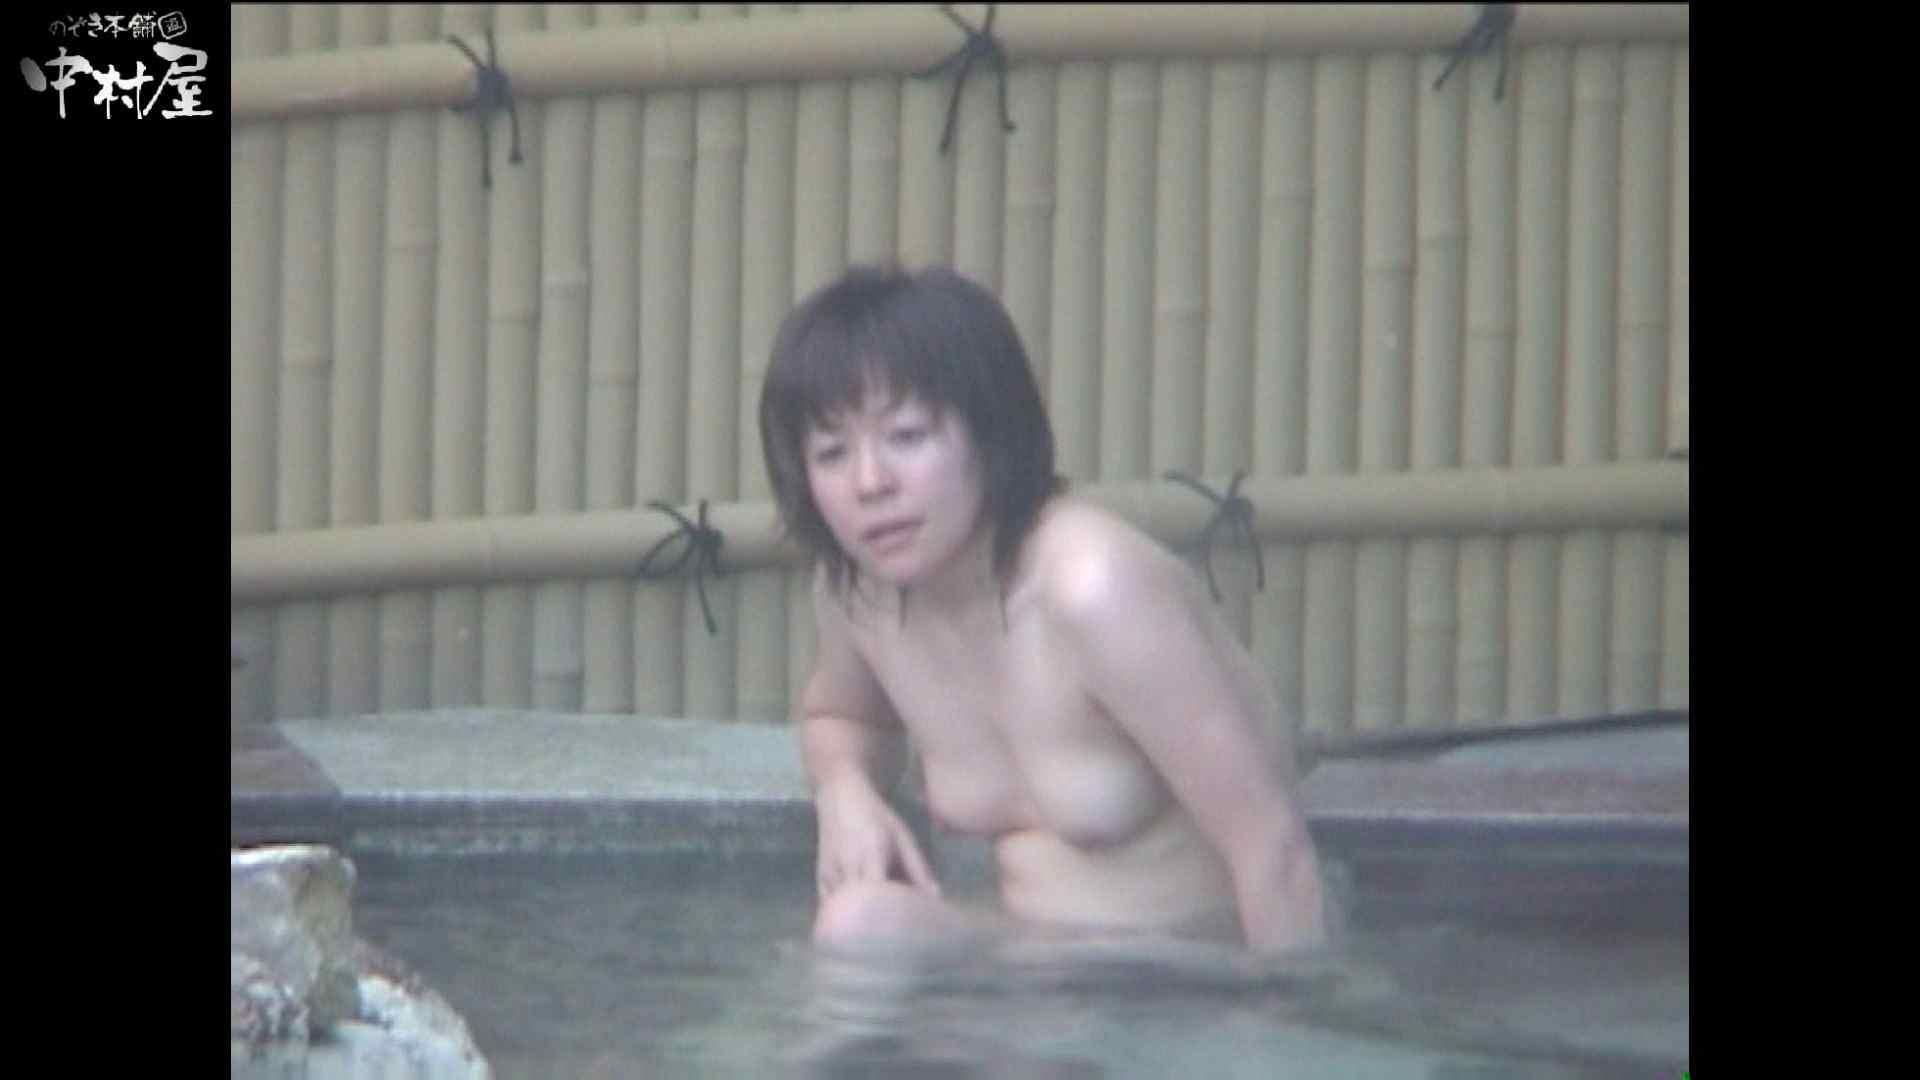 Aquaな露天風呂Vol.985 OLセックス  50画像 39